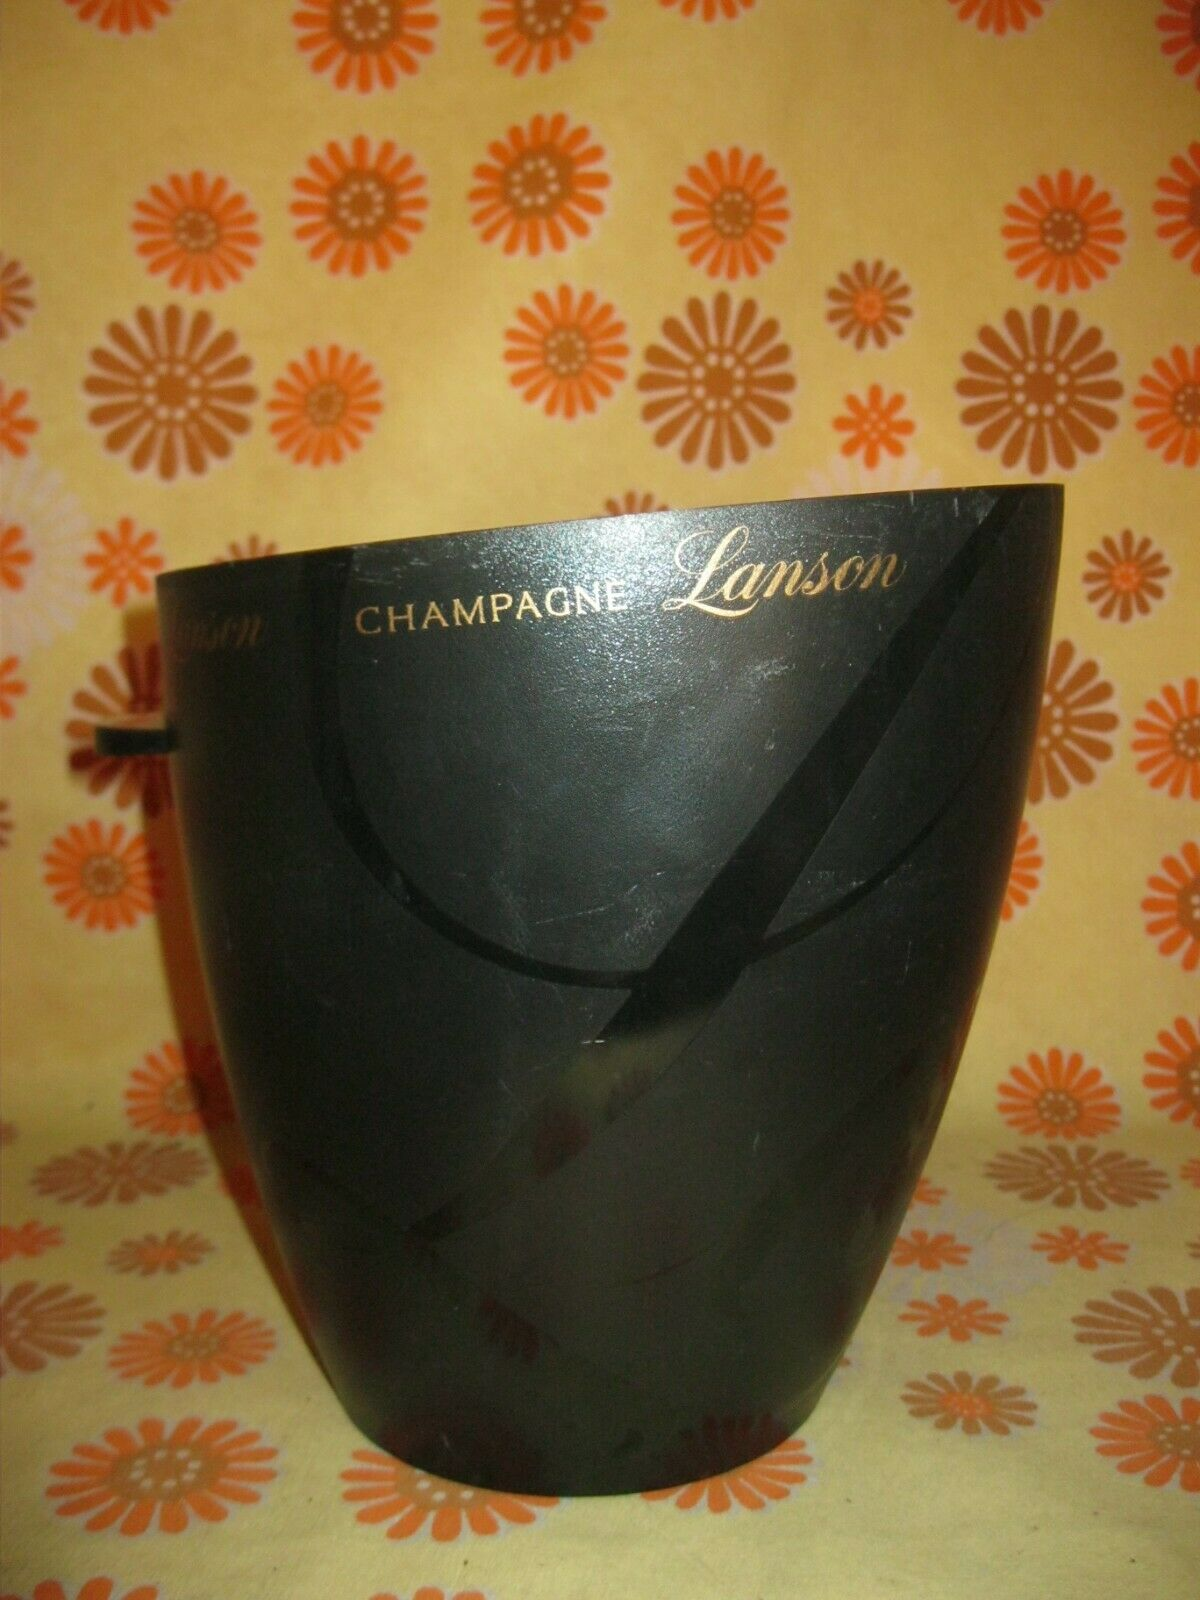 Ancien seau a champagne lanson en plastique pvc ice bucket wine glace french vin